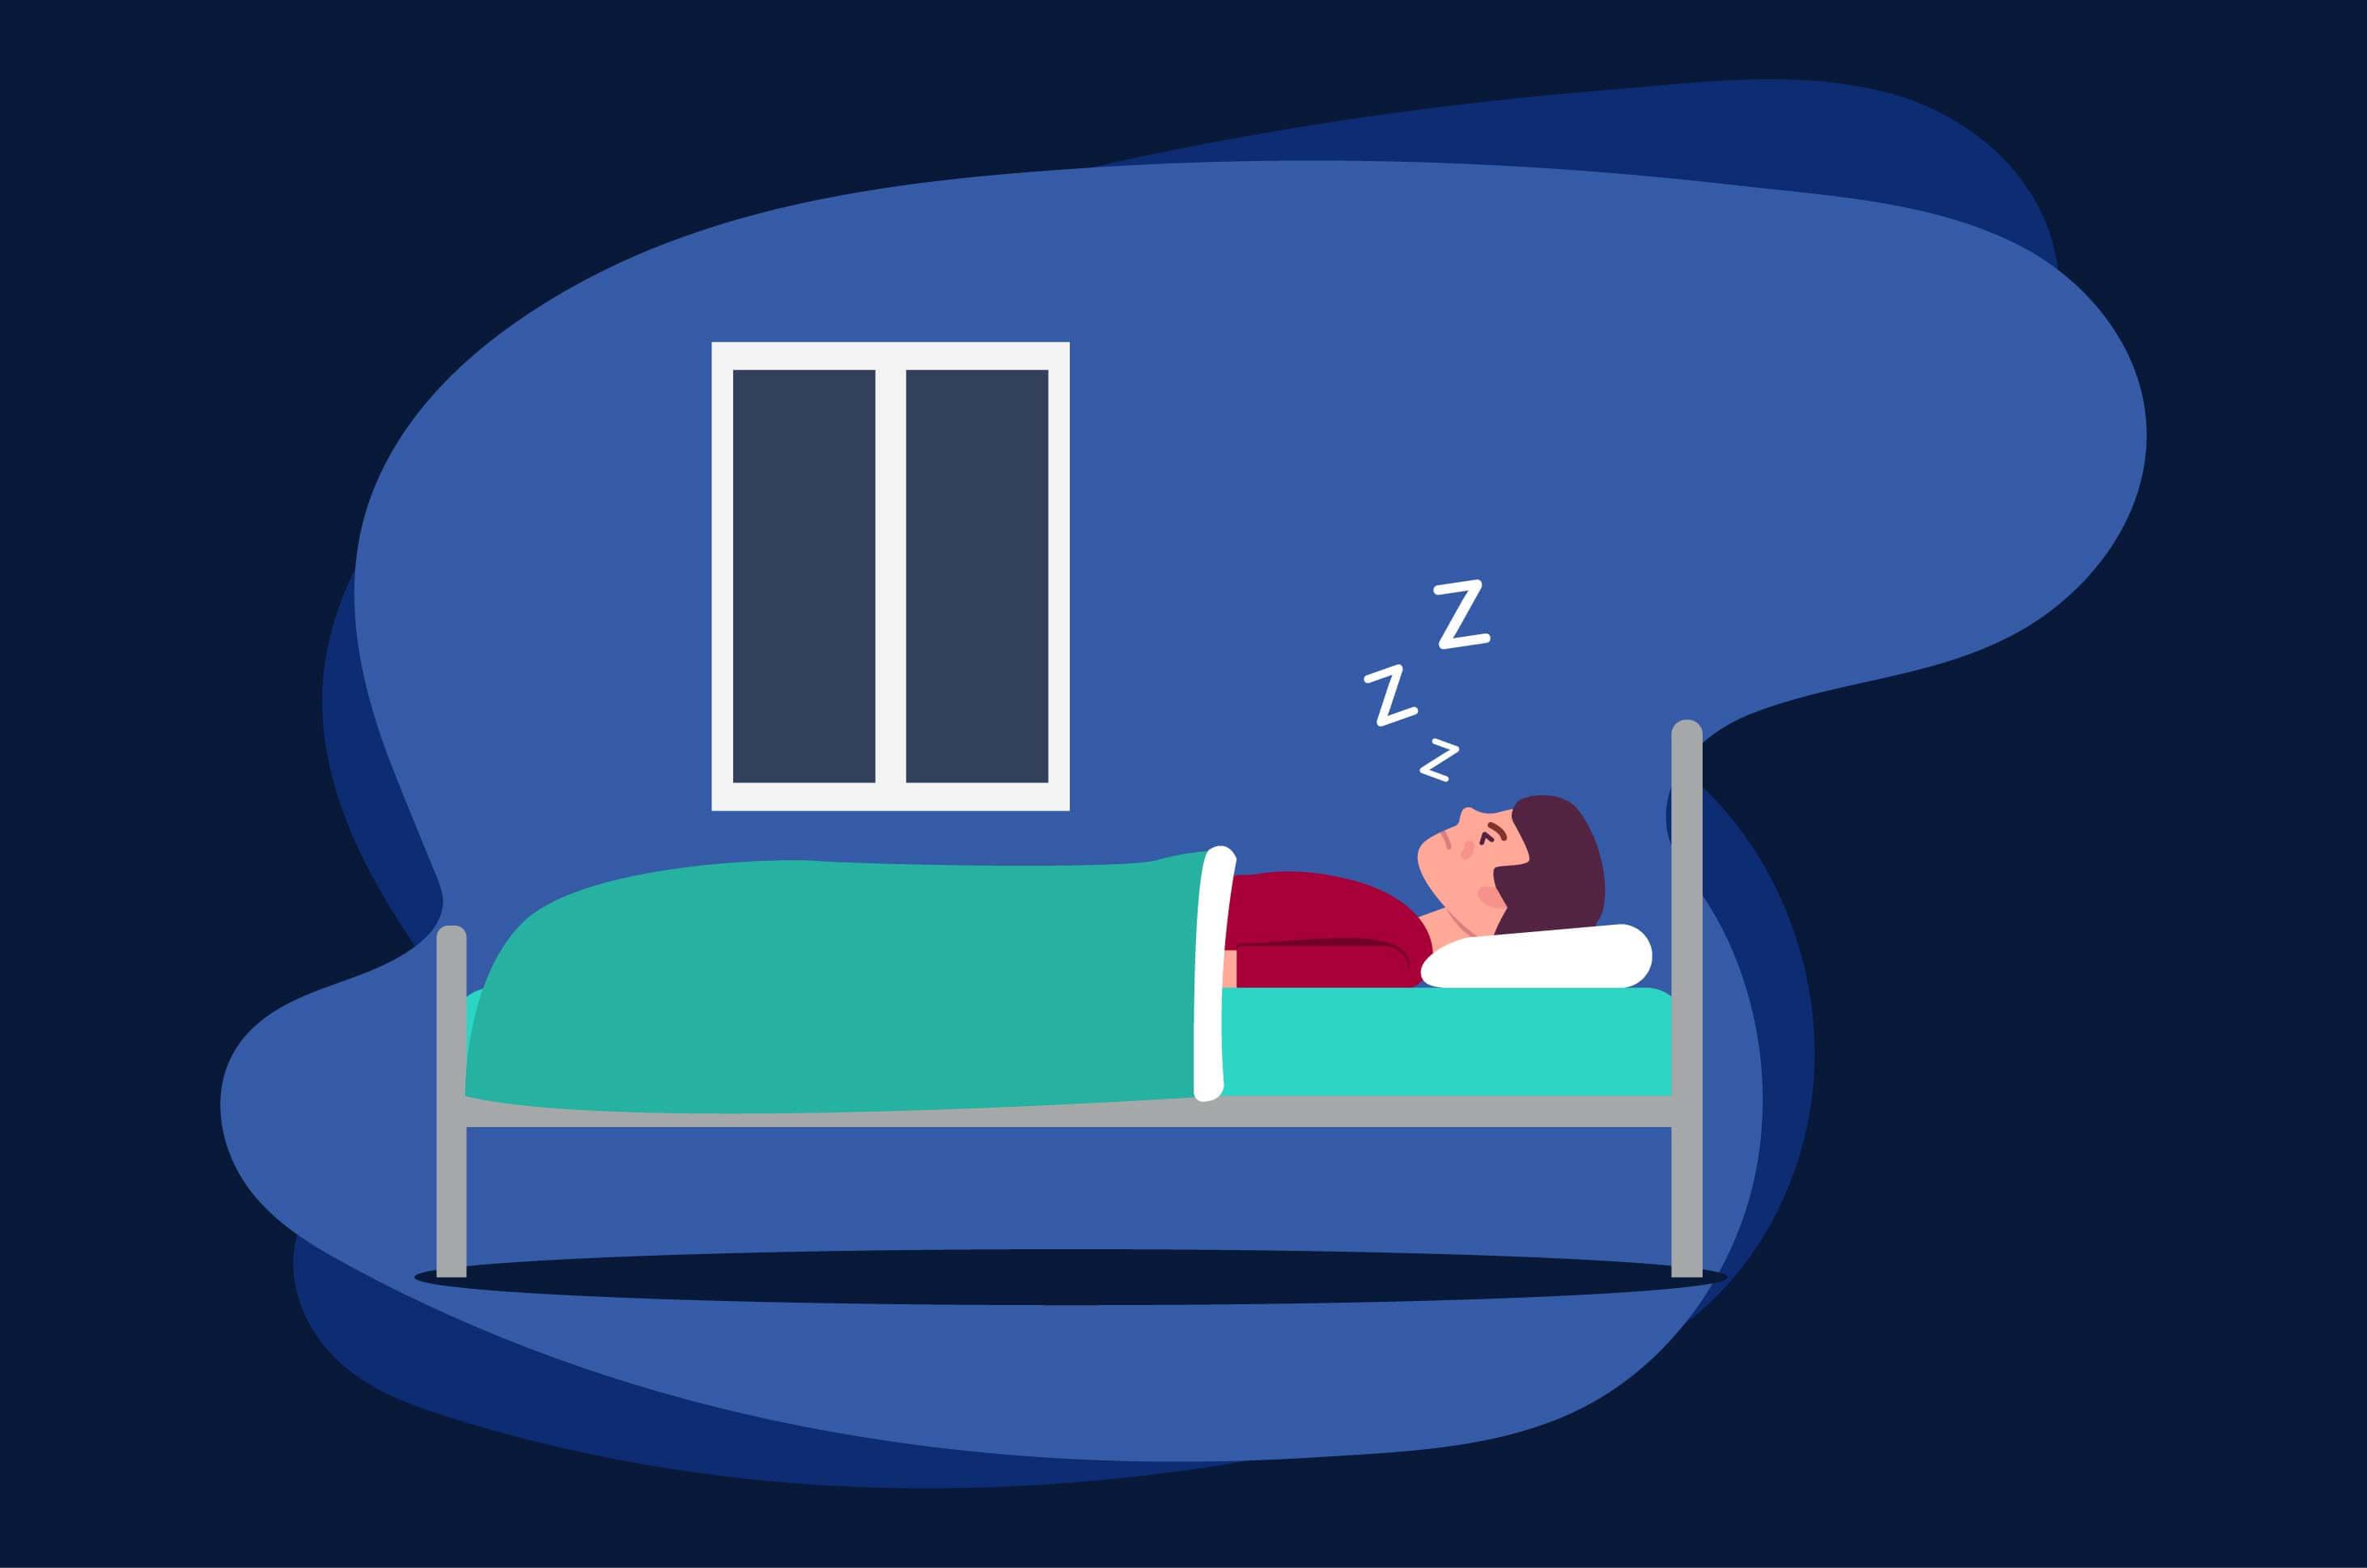 ketindihan-saat-tidur-bisa-jadi-gejala-hemiplegia